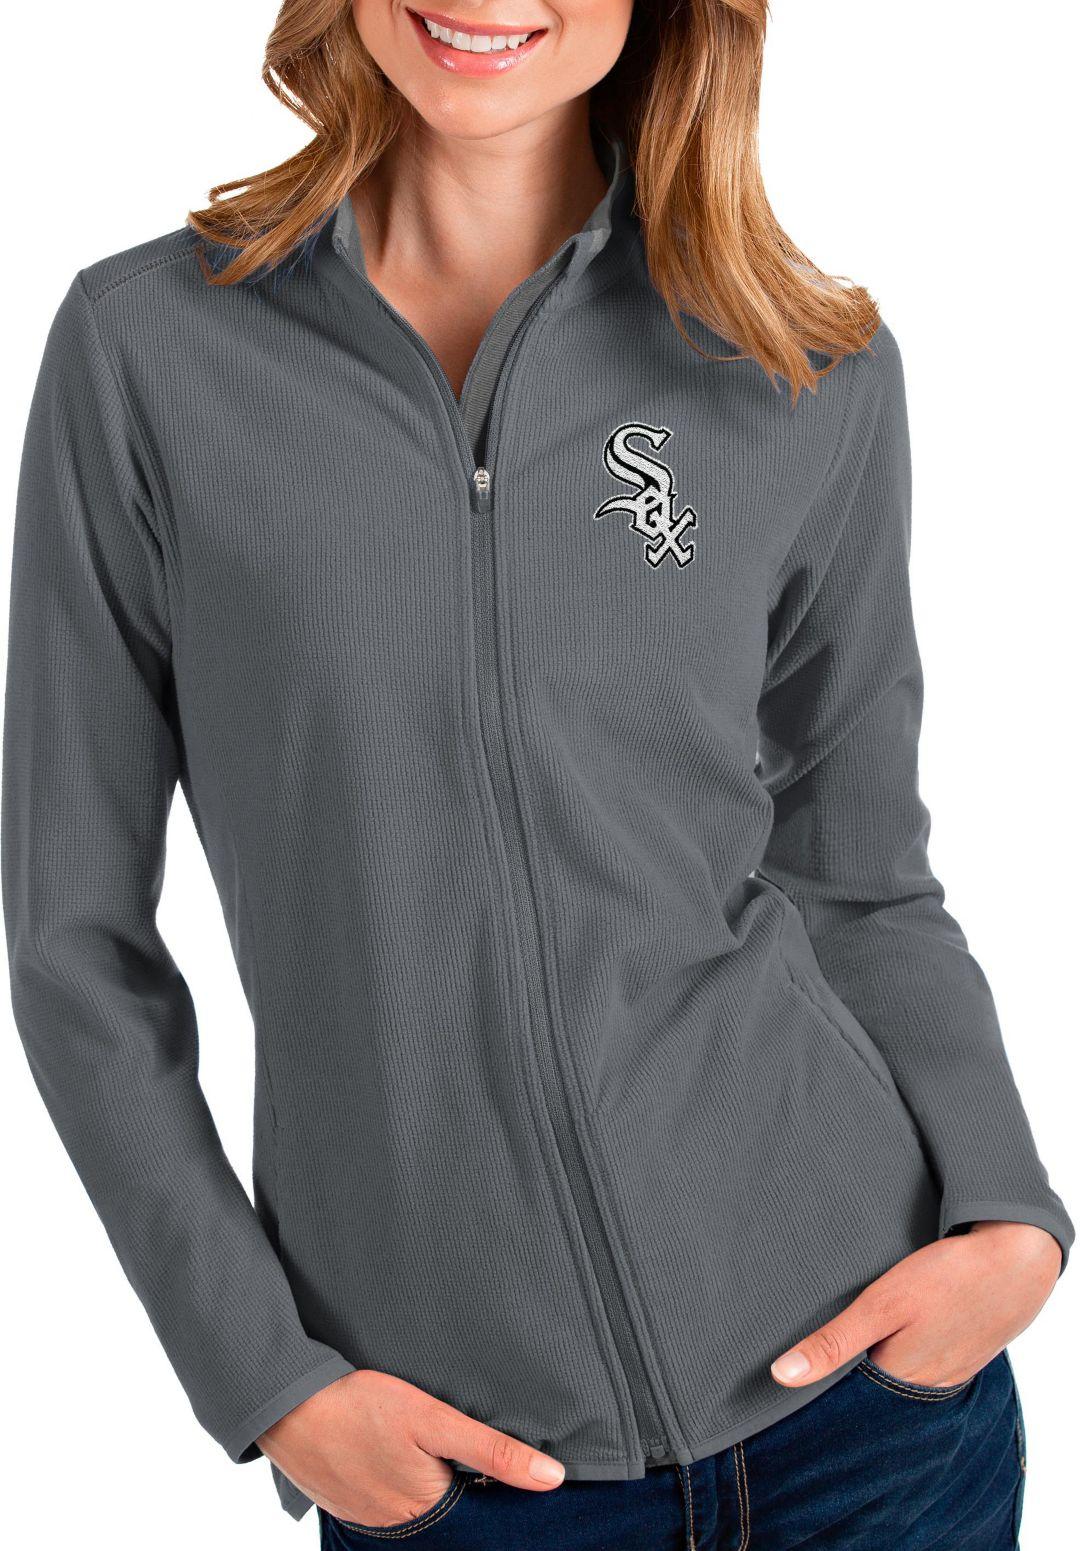 wholesale dealer 30c83 74153 Antigua Women's Chicago White Sox Grey Glacier Quarter-Zip Pullover